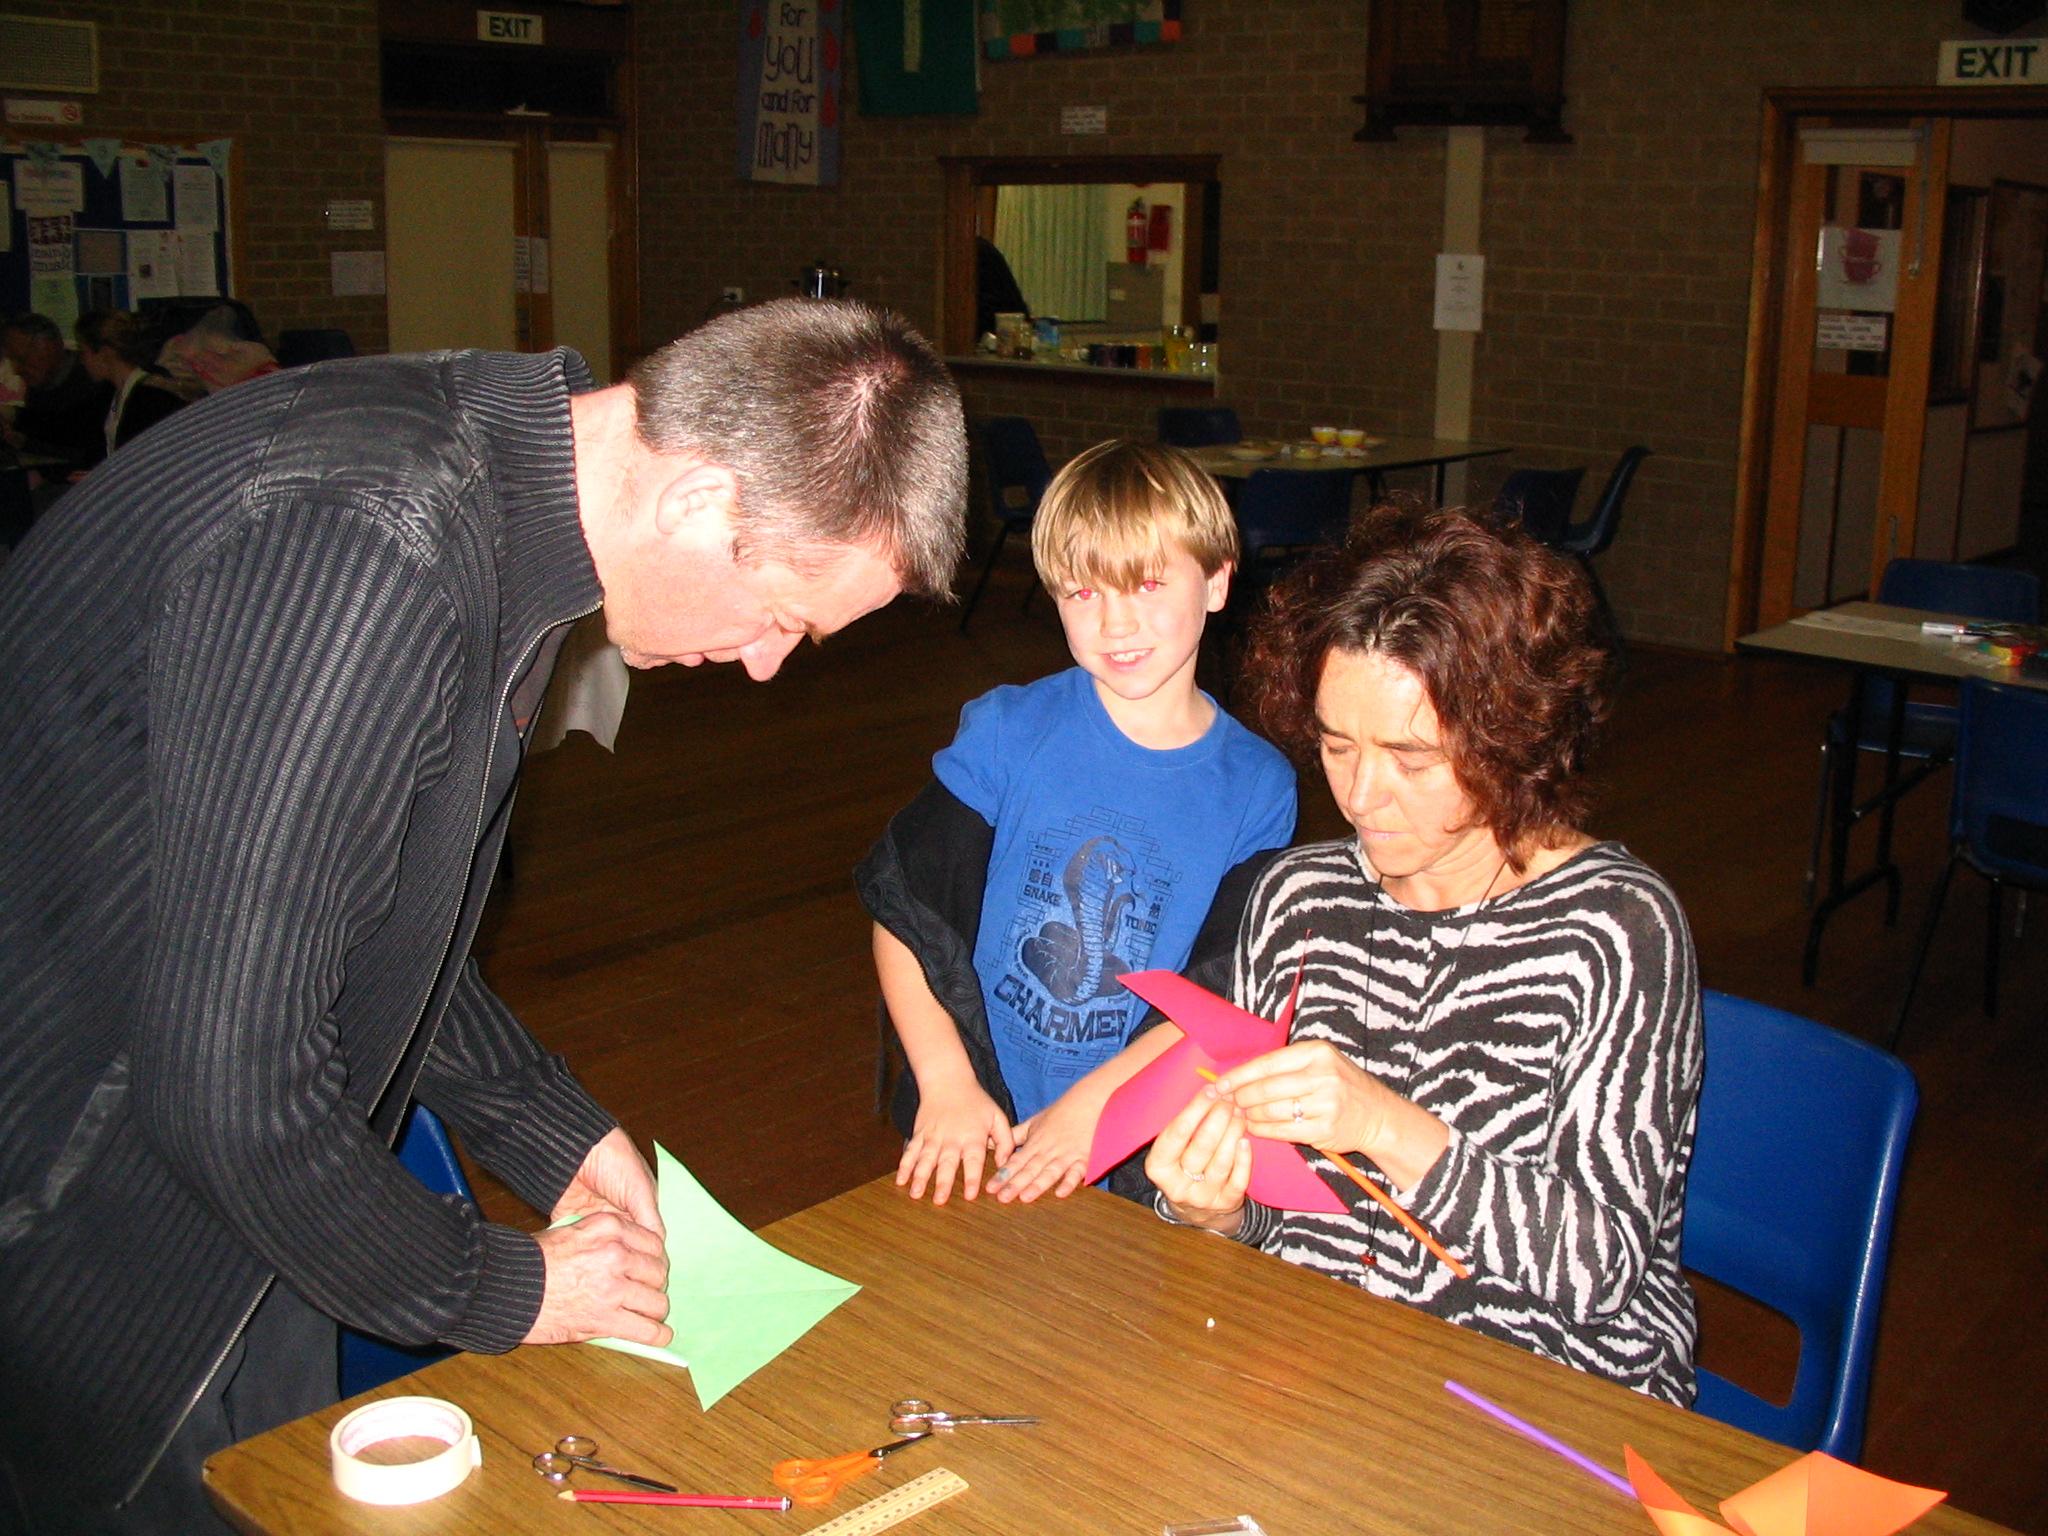 jonathon, Dom & Mary making pin-wheels